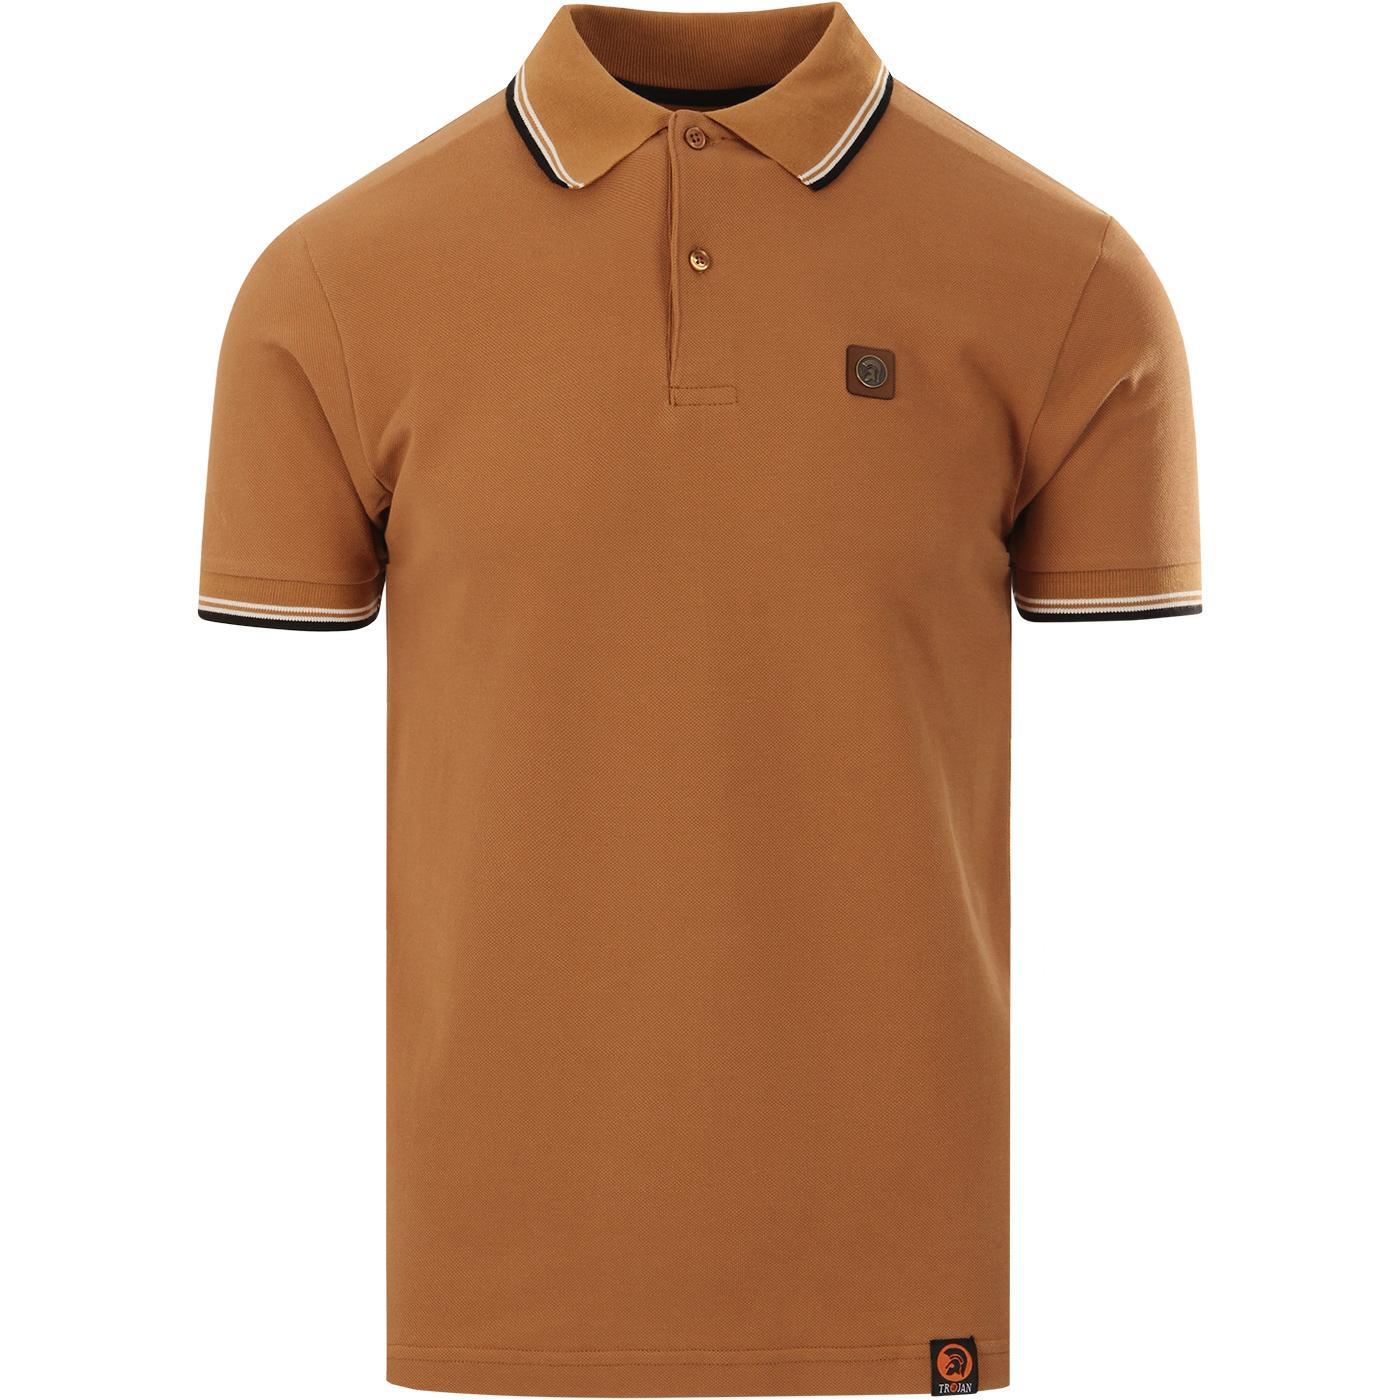 TROJAN RECORDS Classic Tipped Mod Polo Shirt TAN